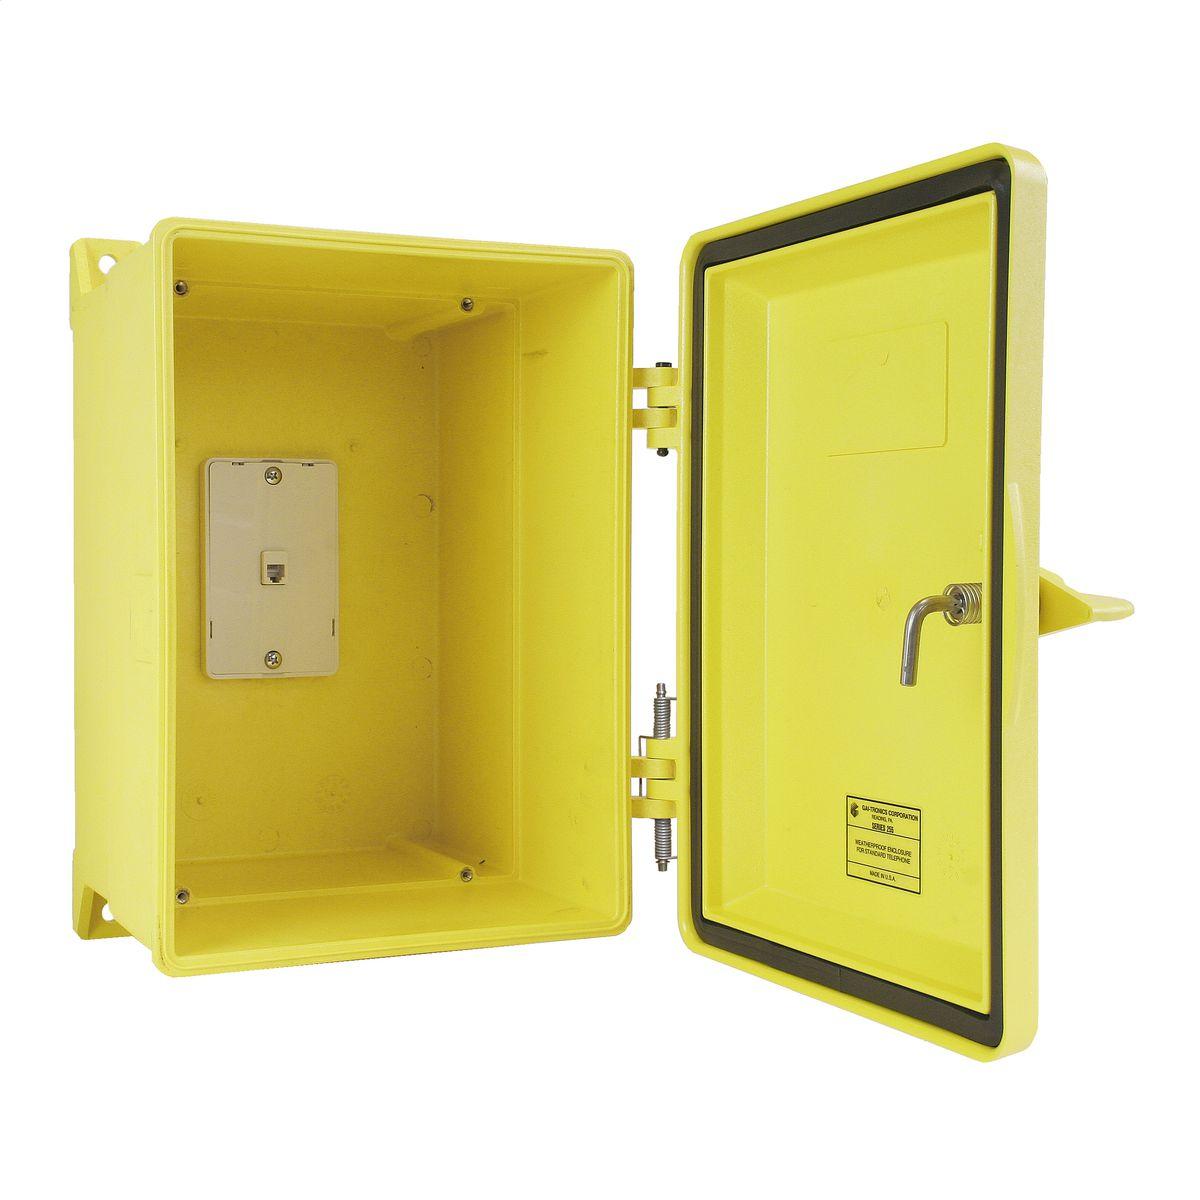 255-003YLSK  sc 1 st  Hubbell & Weatherproof Telephone Enclosure | Brand | GAI-Tronics